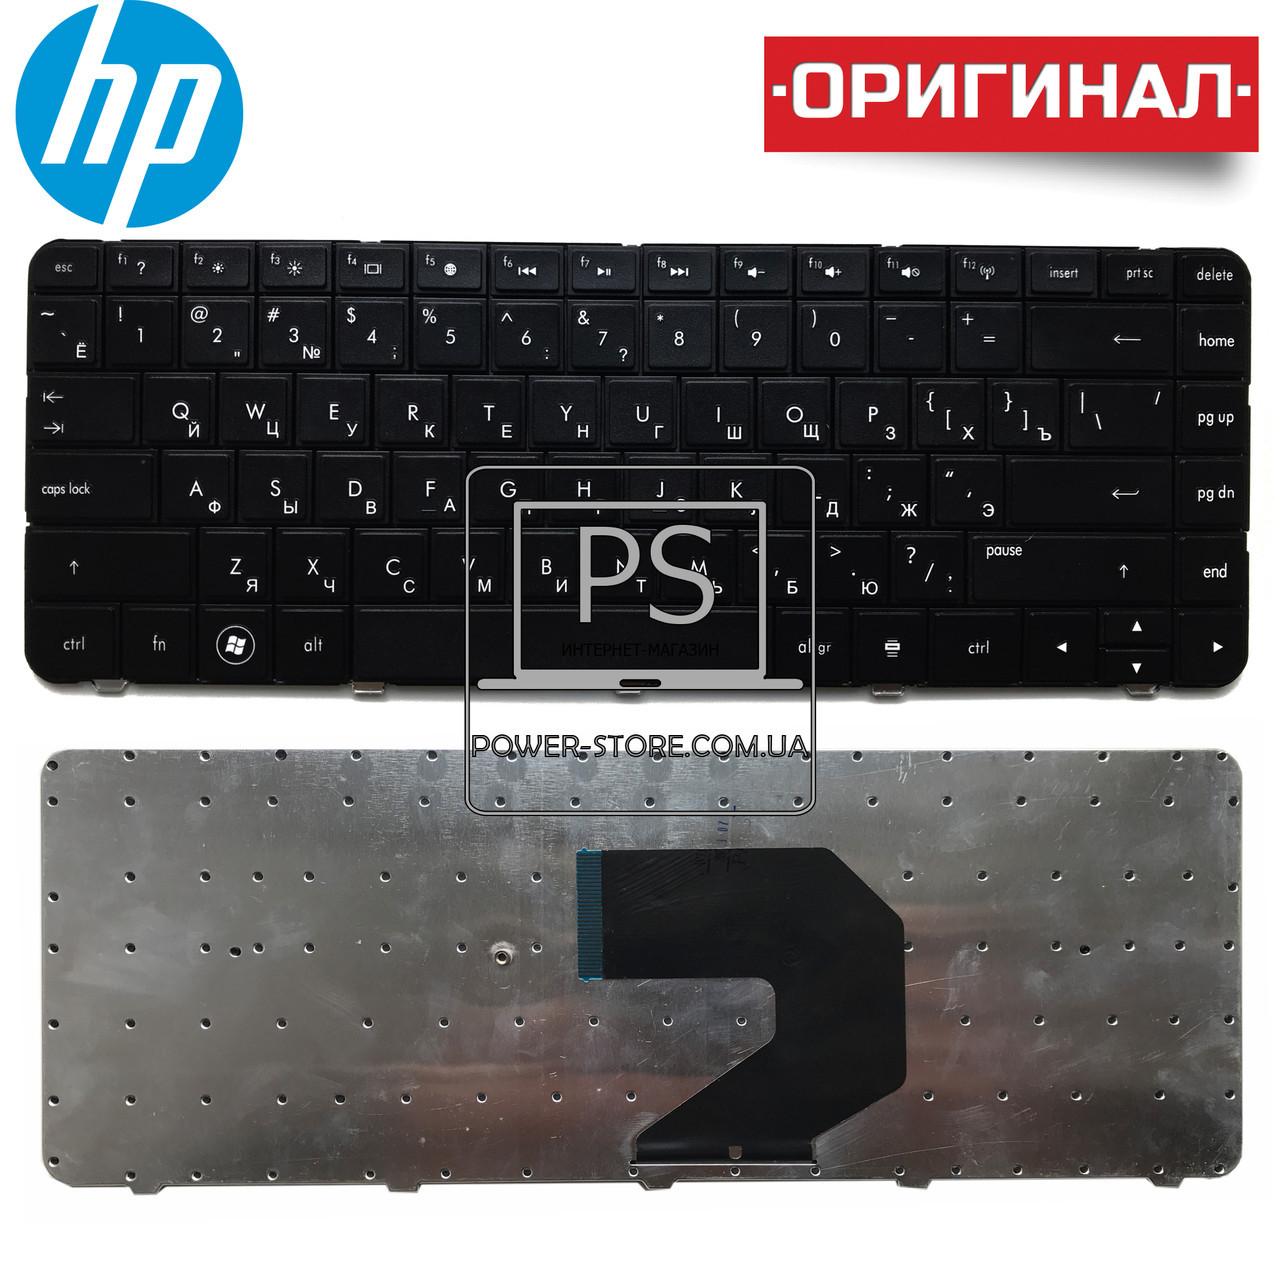 Клавиатура для ноутбука HP 698694-171, 698694-201, 698694-211, 698694-221, 698694-241, 698694-251